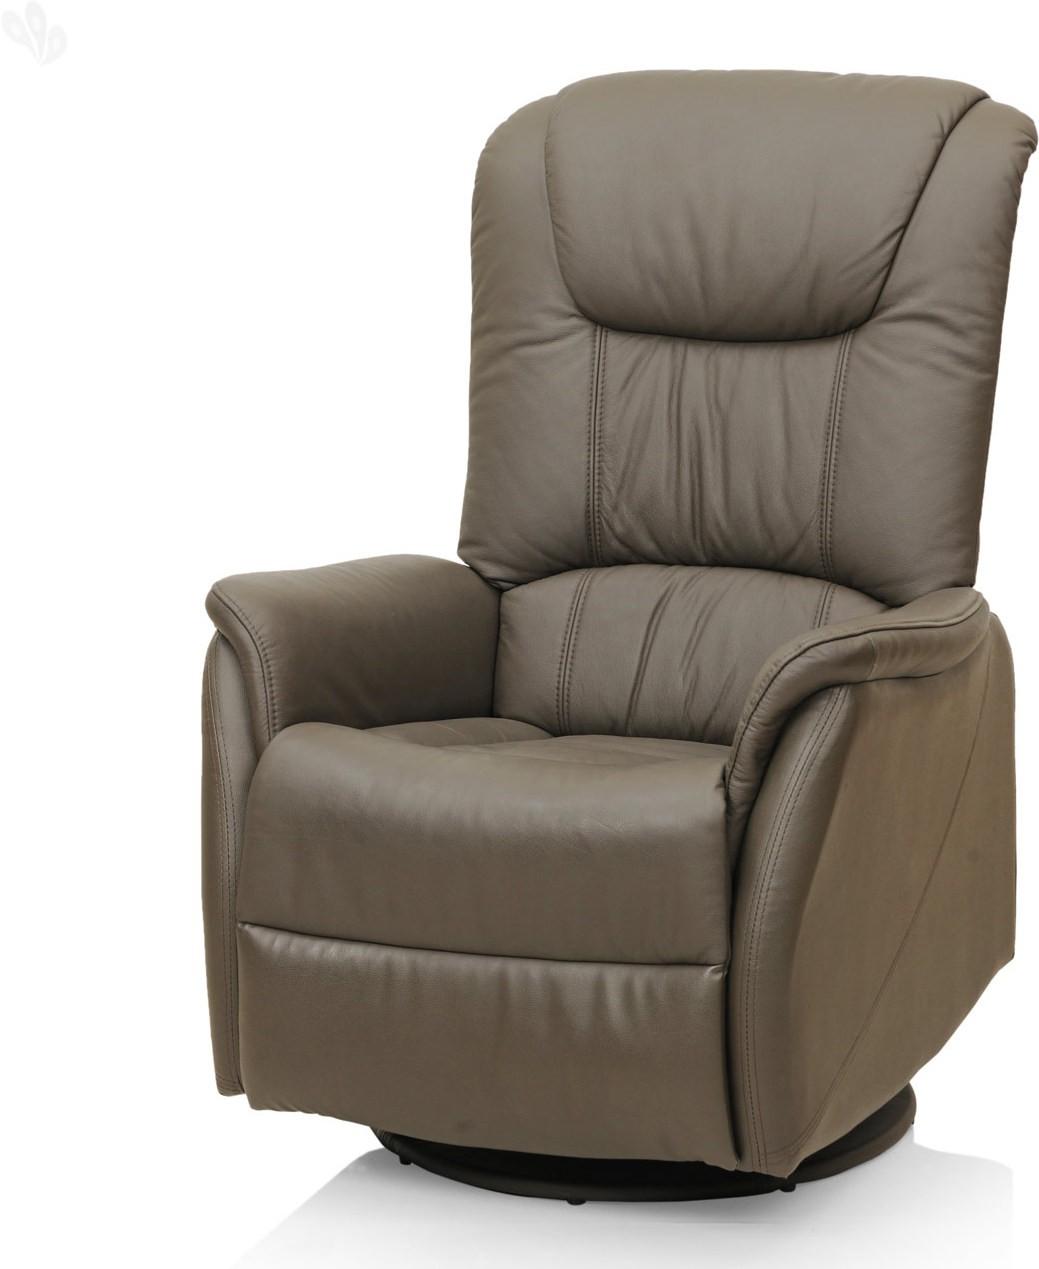 View RoyalOak Leisure Leather Manual Recliners(Finish Color - Grey) Furniture (RoyalOak)